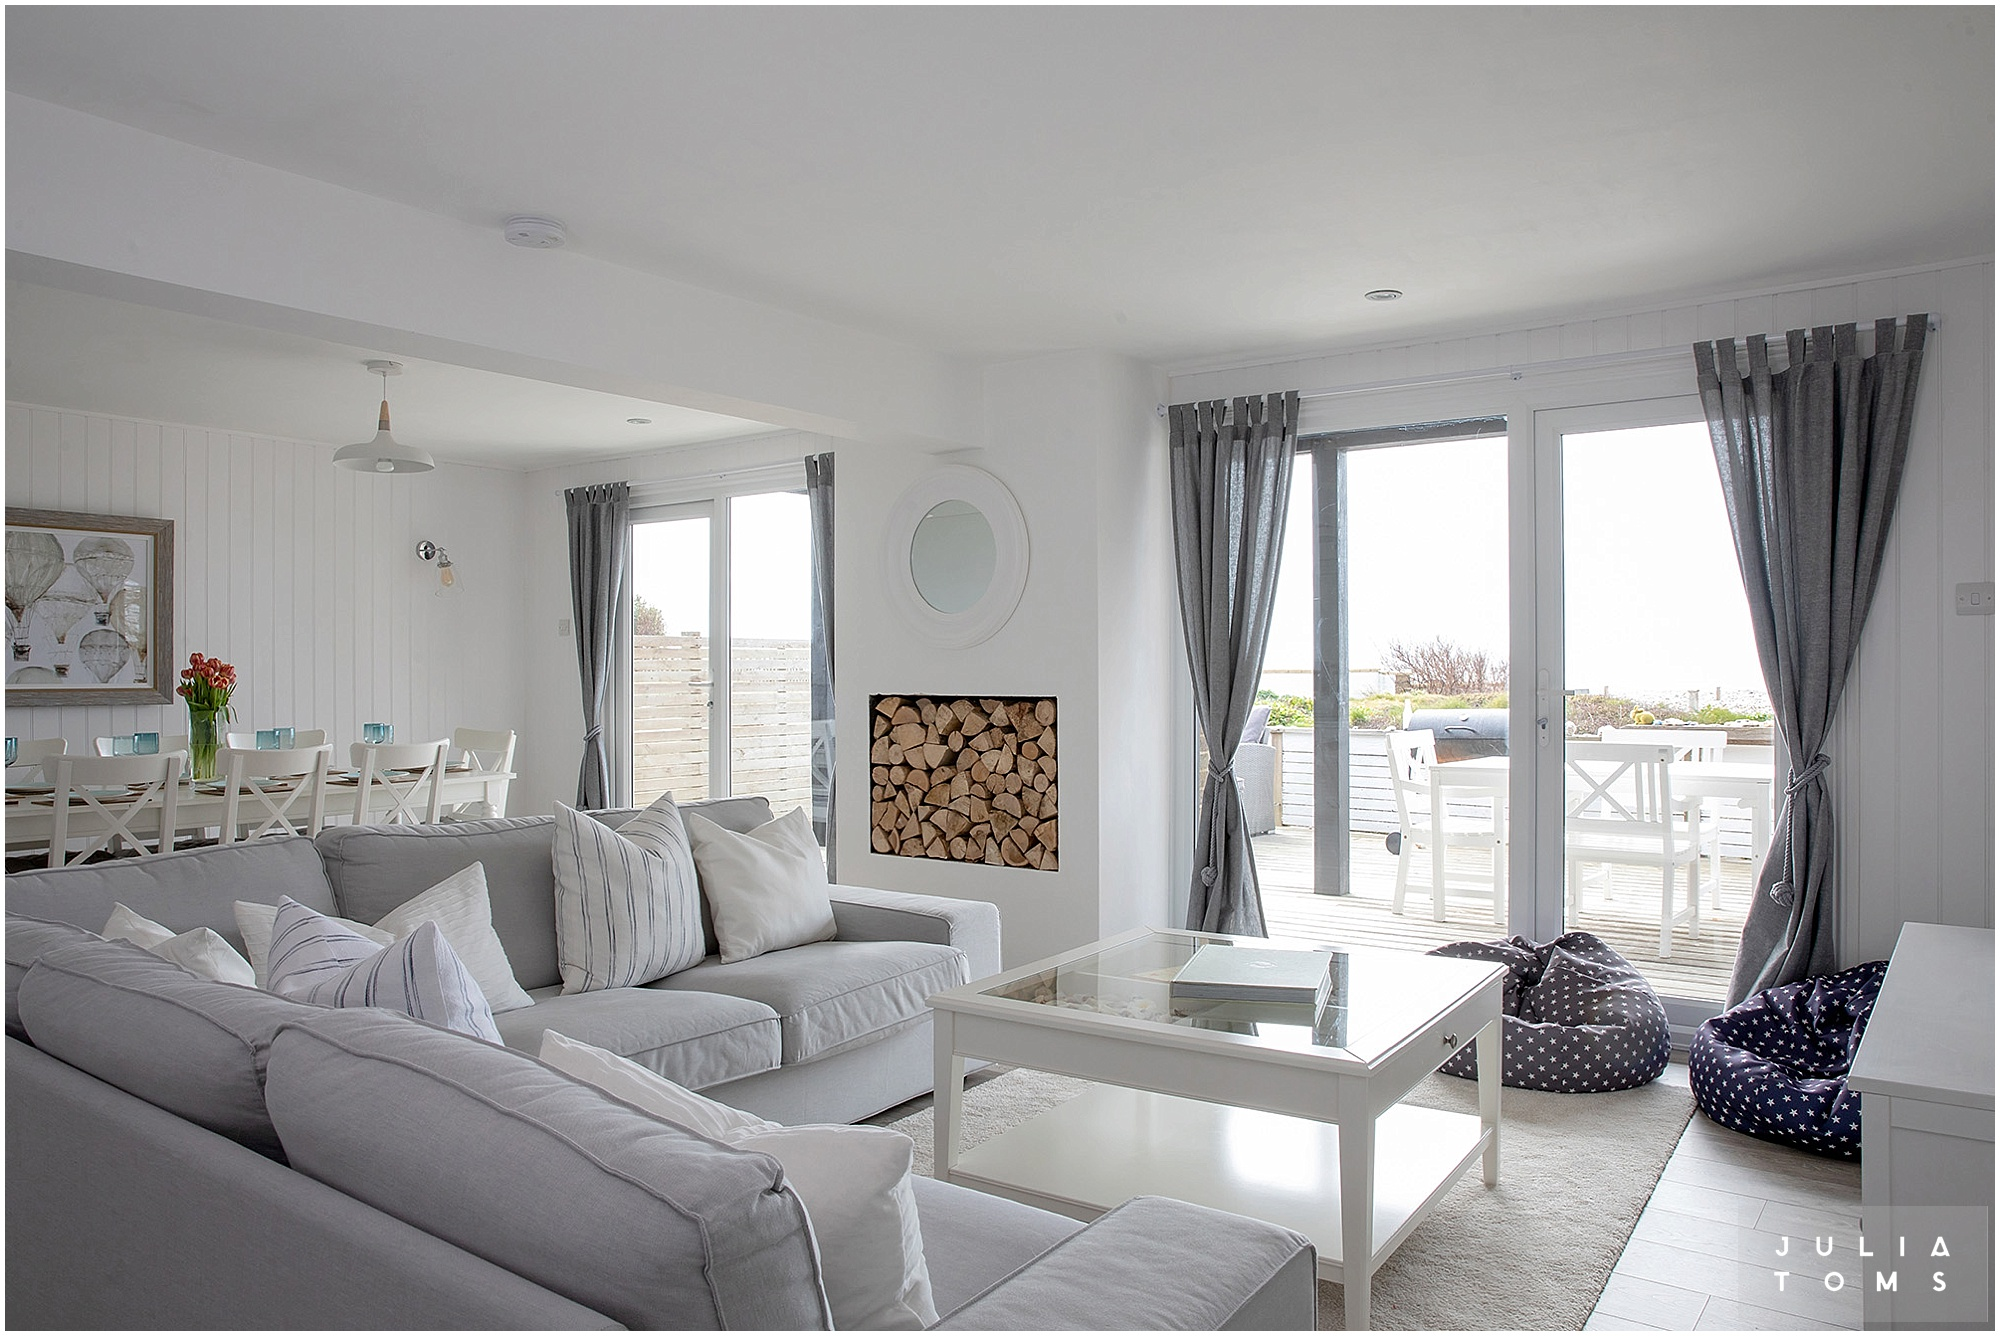 julia_toms_interiors_holiday_rental_002.jpg